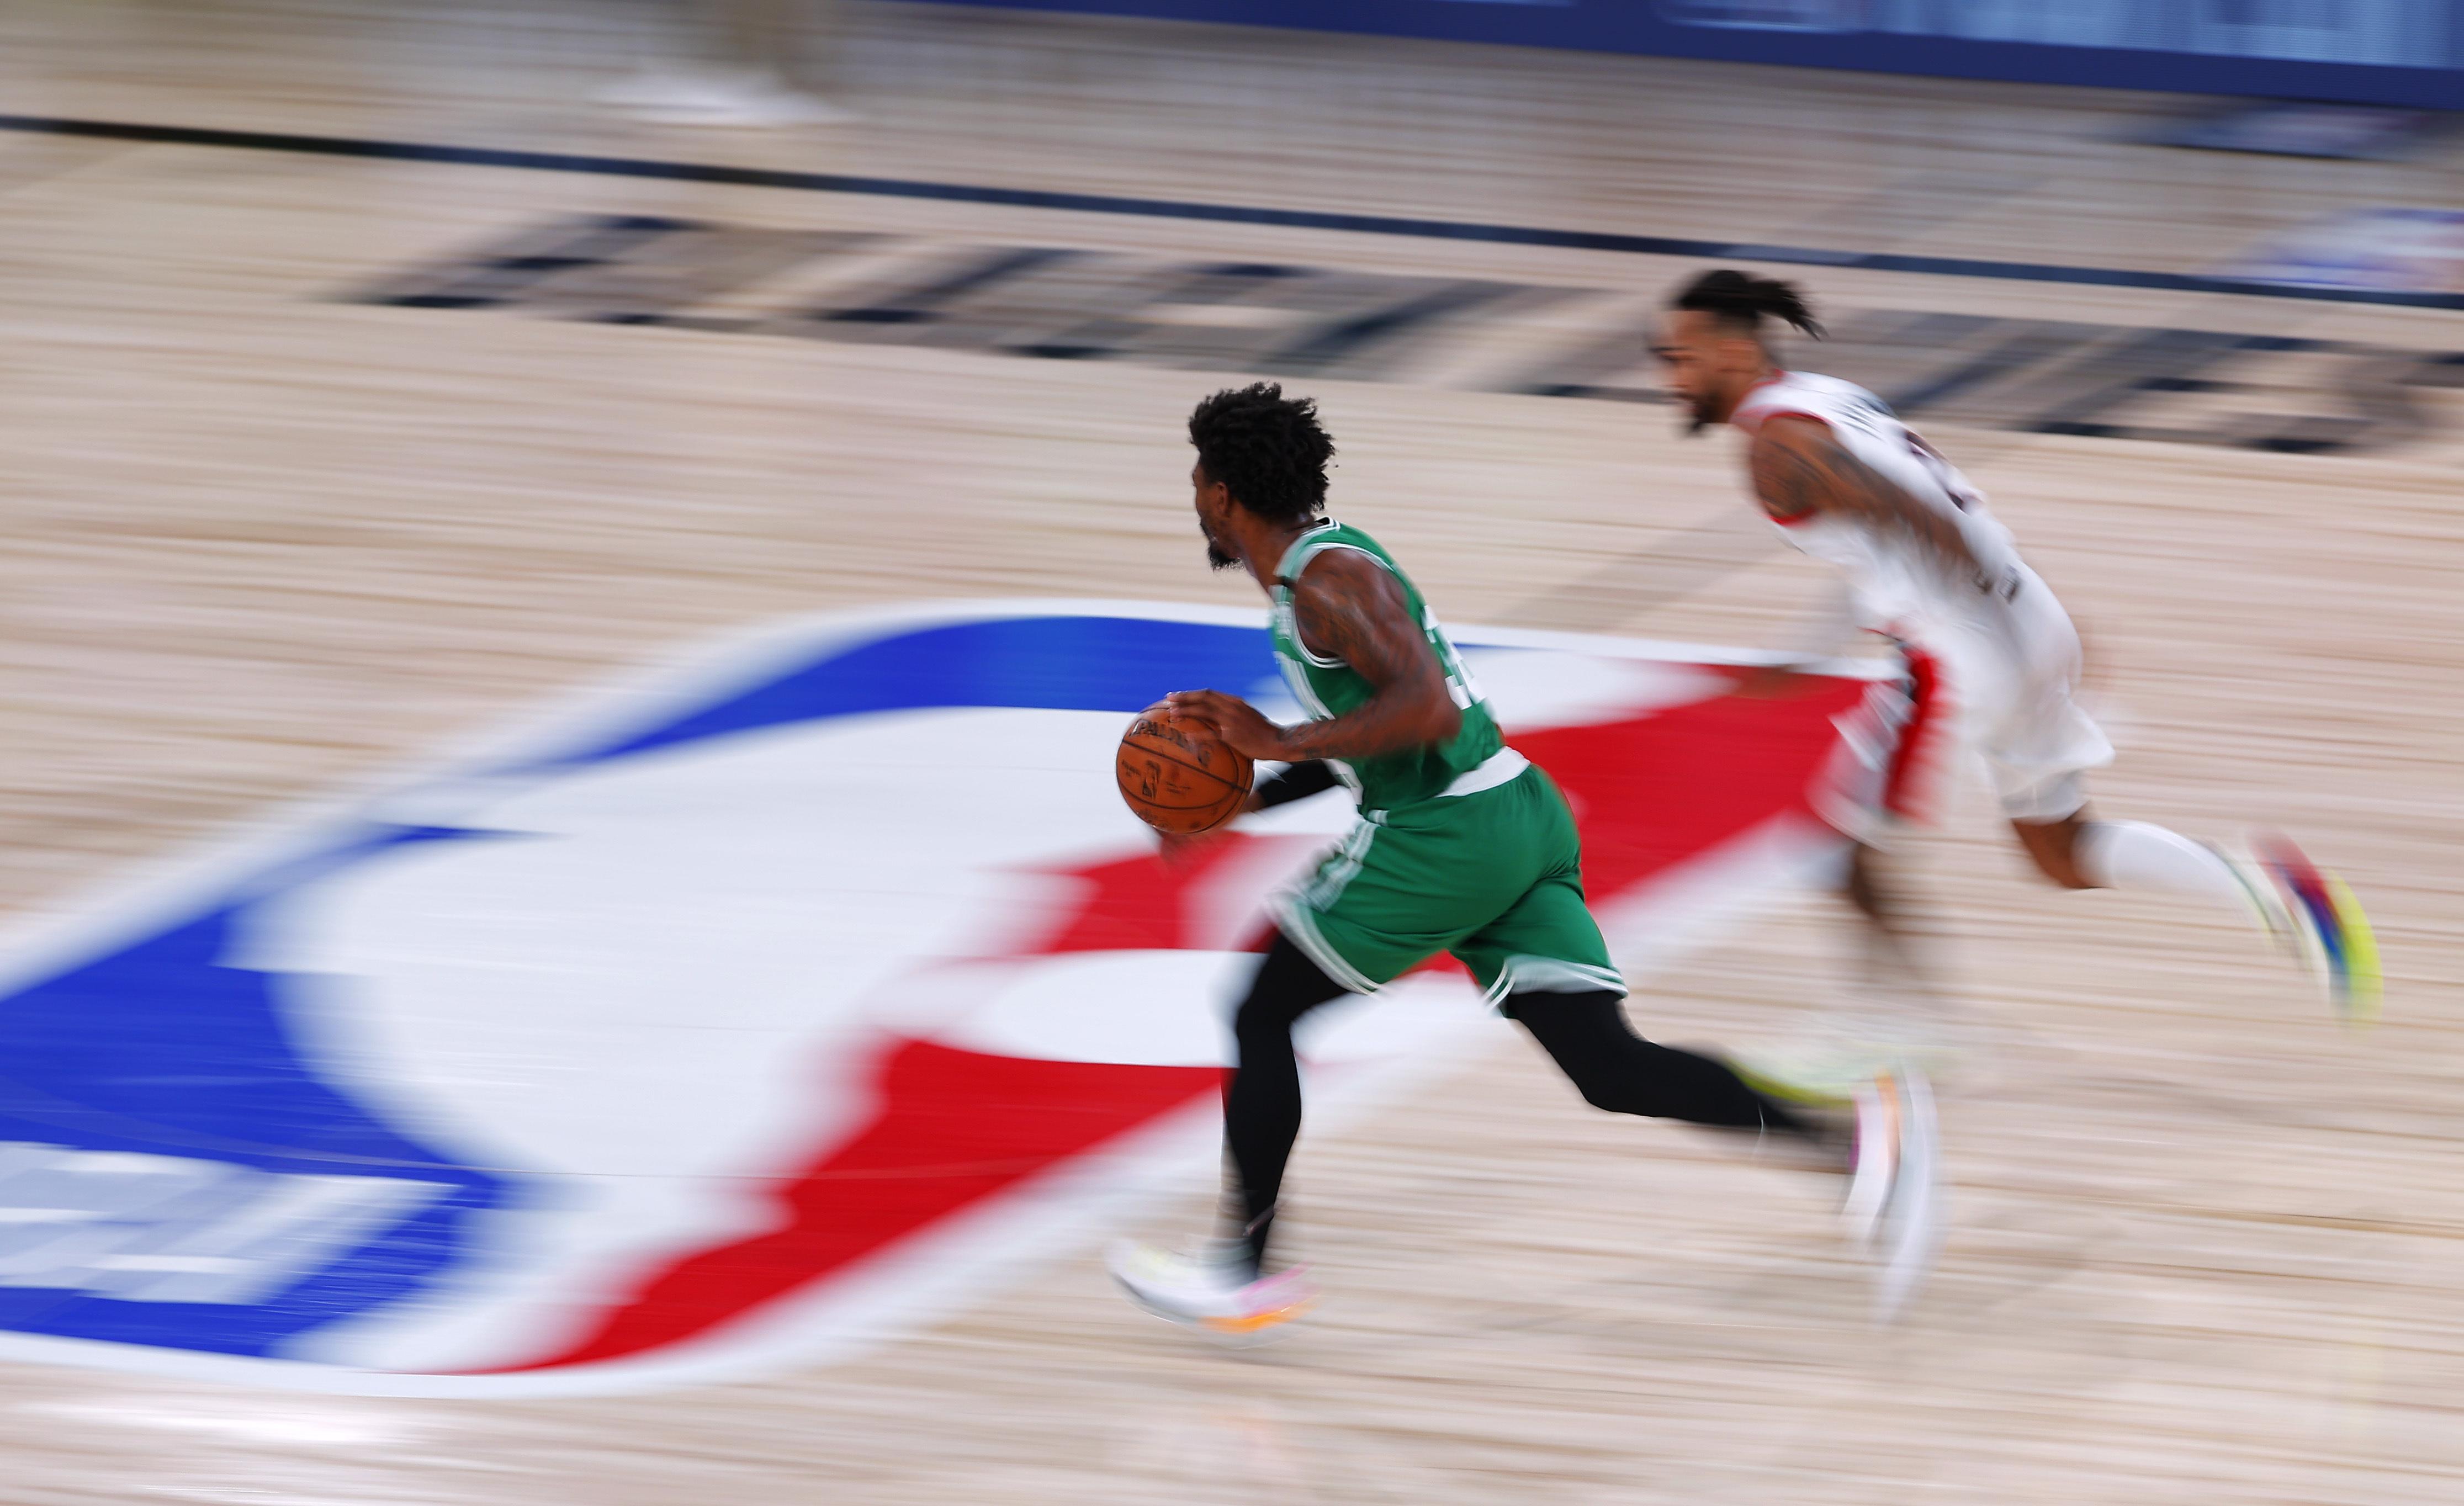 Boston Celtics vs. Miami Heat FREE LIVE STREAM (8/4/20): Watch NBA restart  online